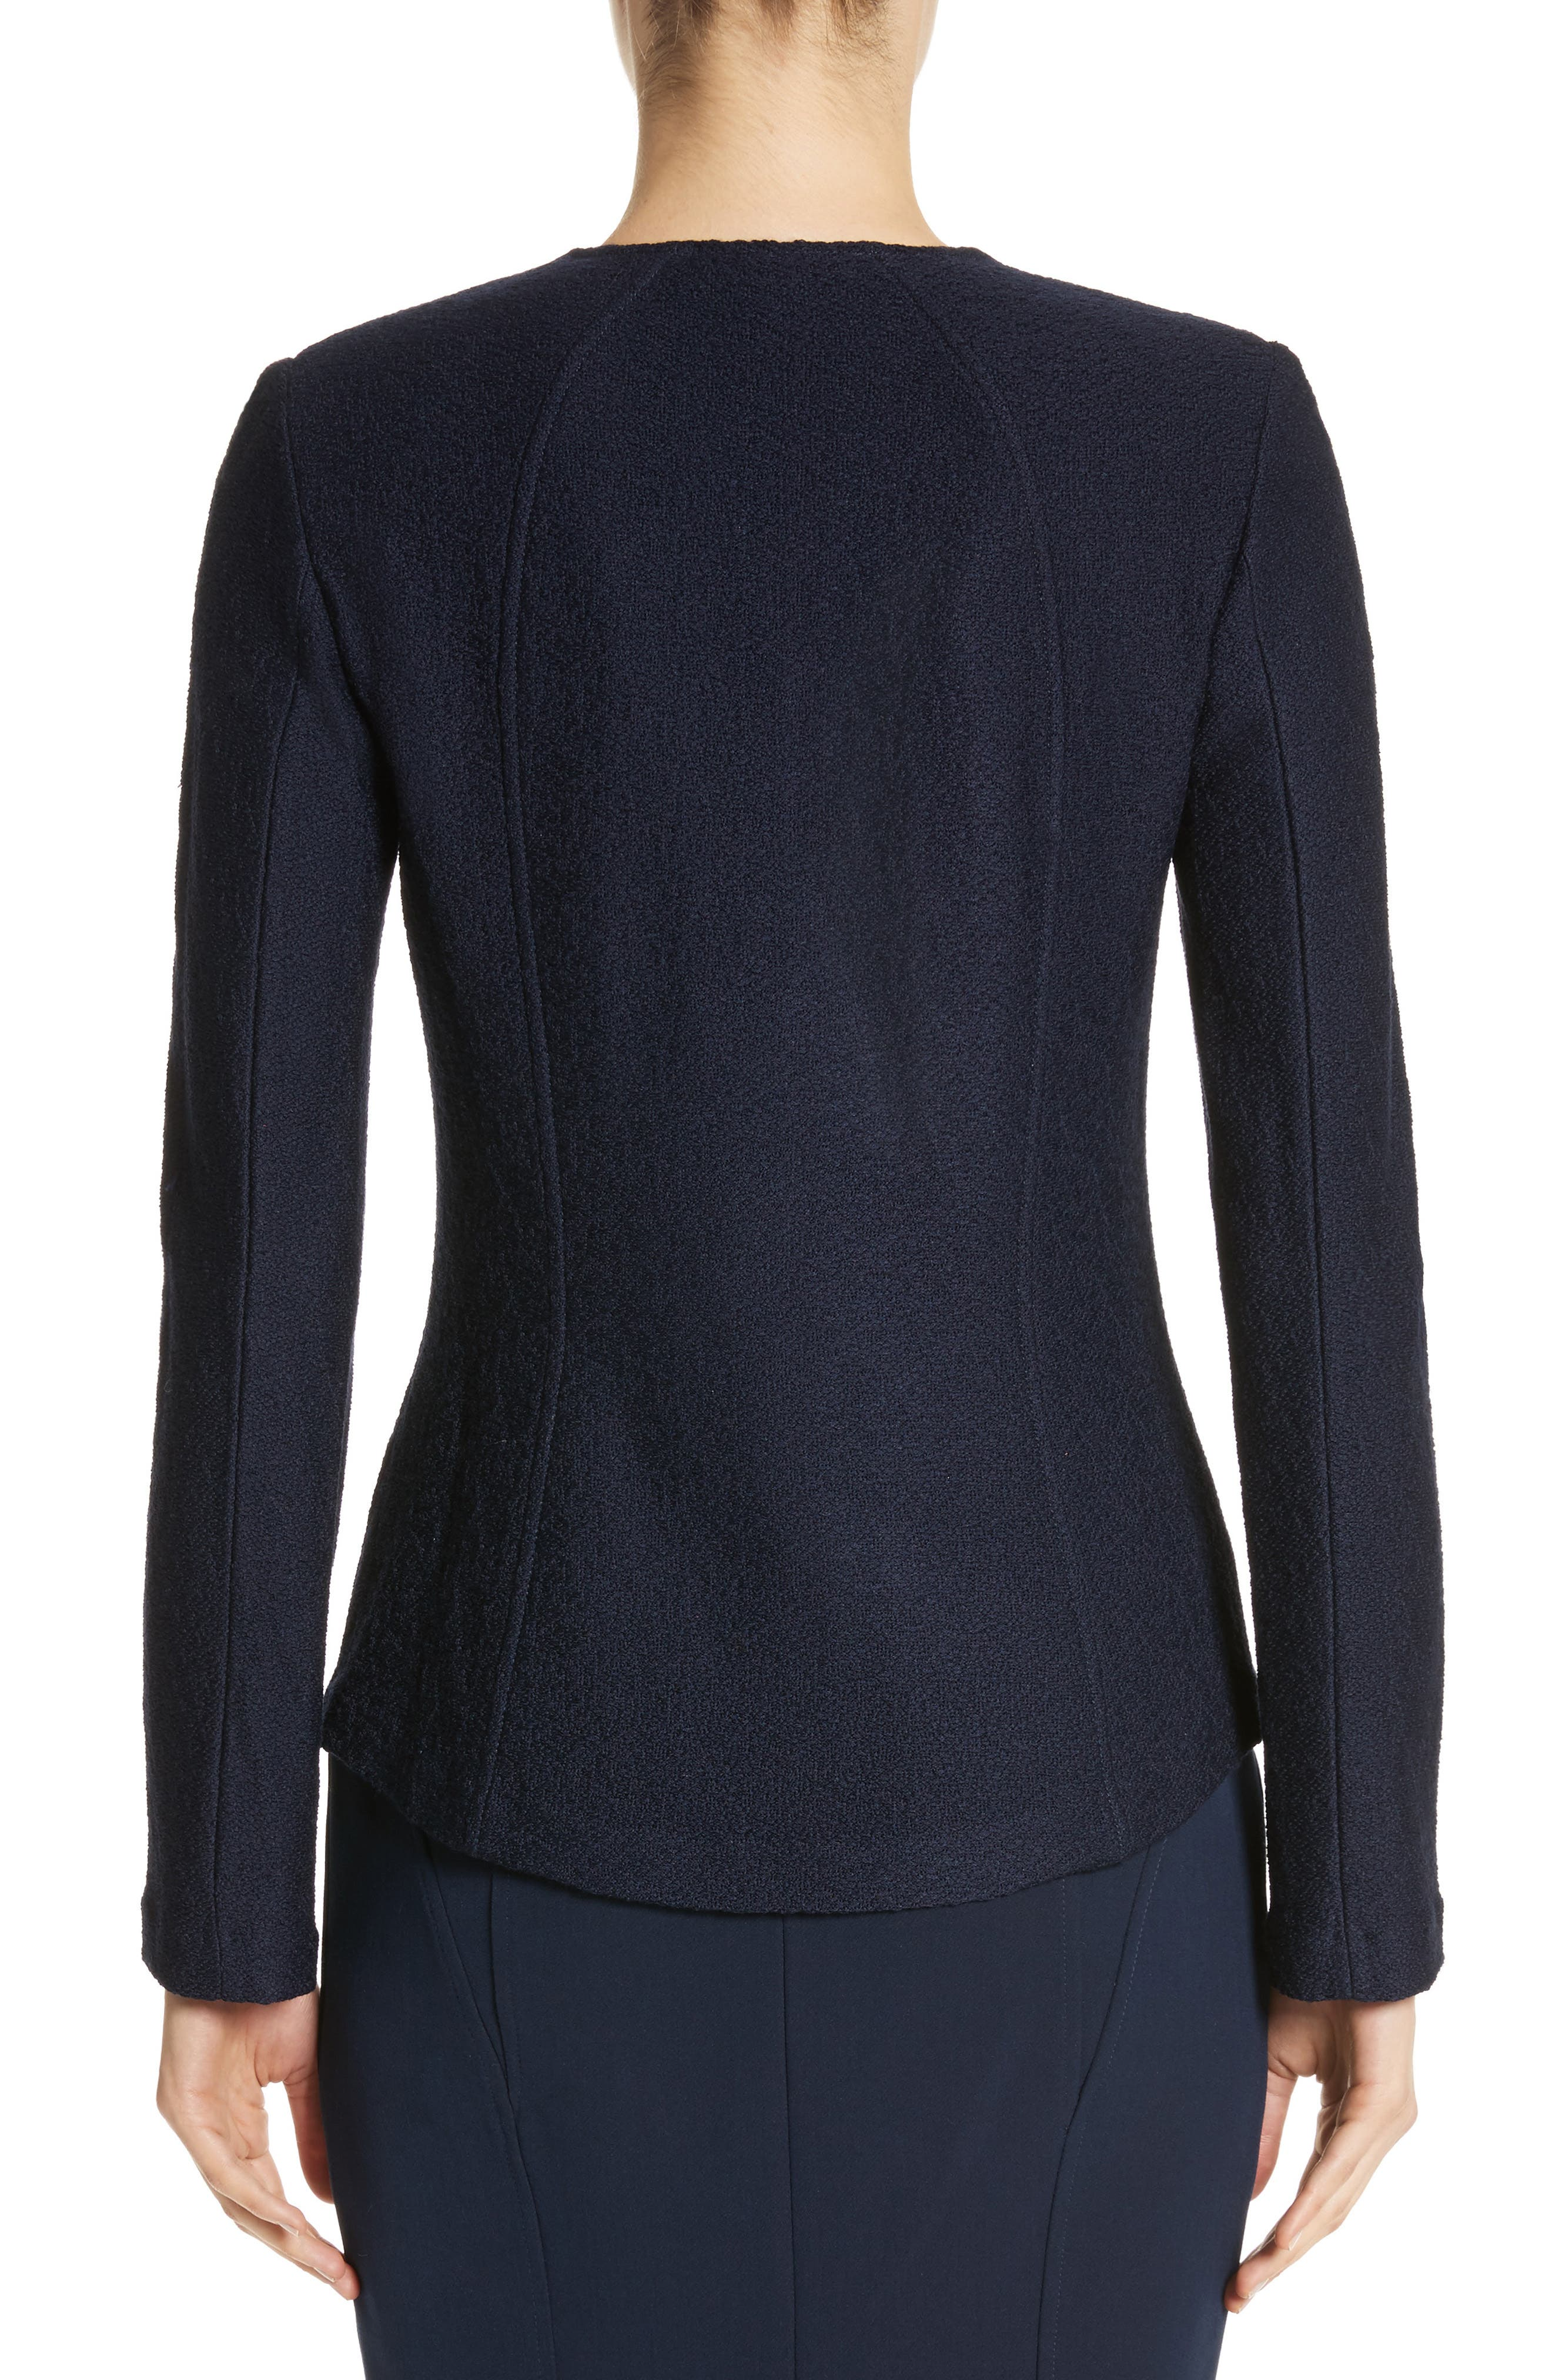 Hannah Knit Jacket,                             Alternate thumbnail 2, color,                             Navy